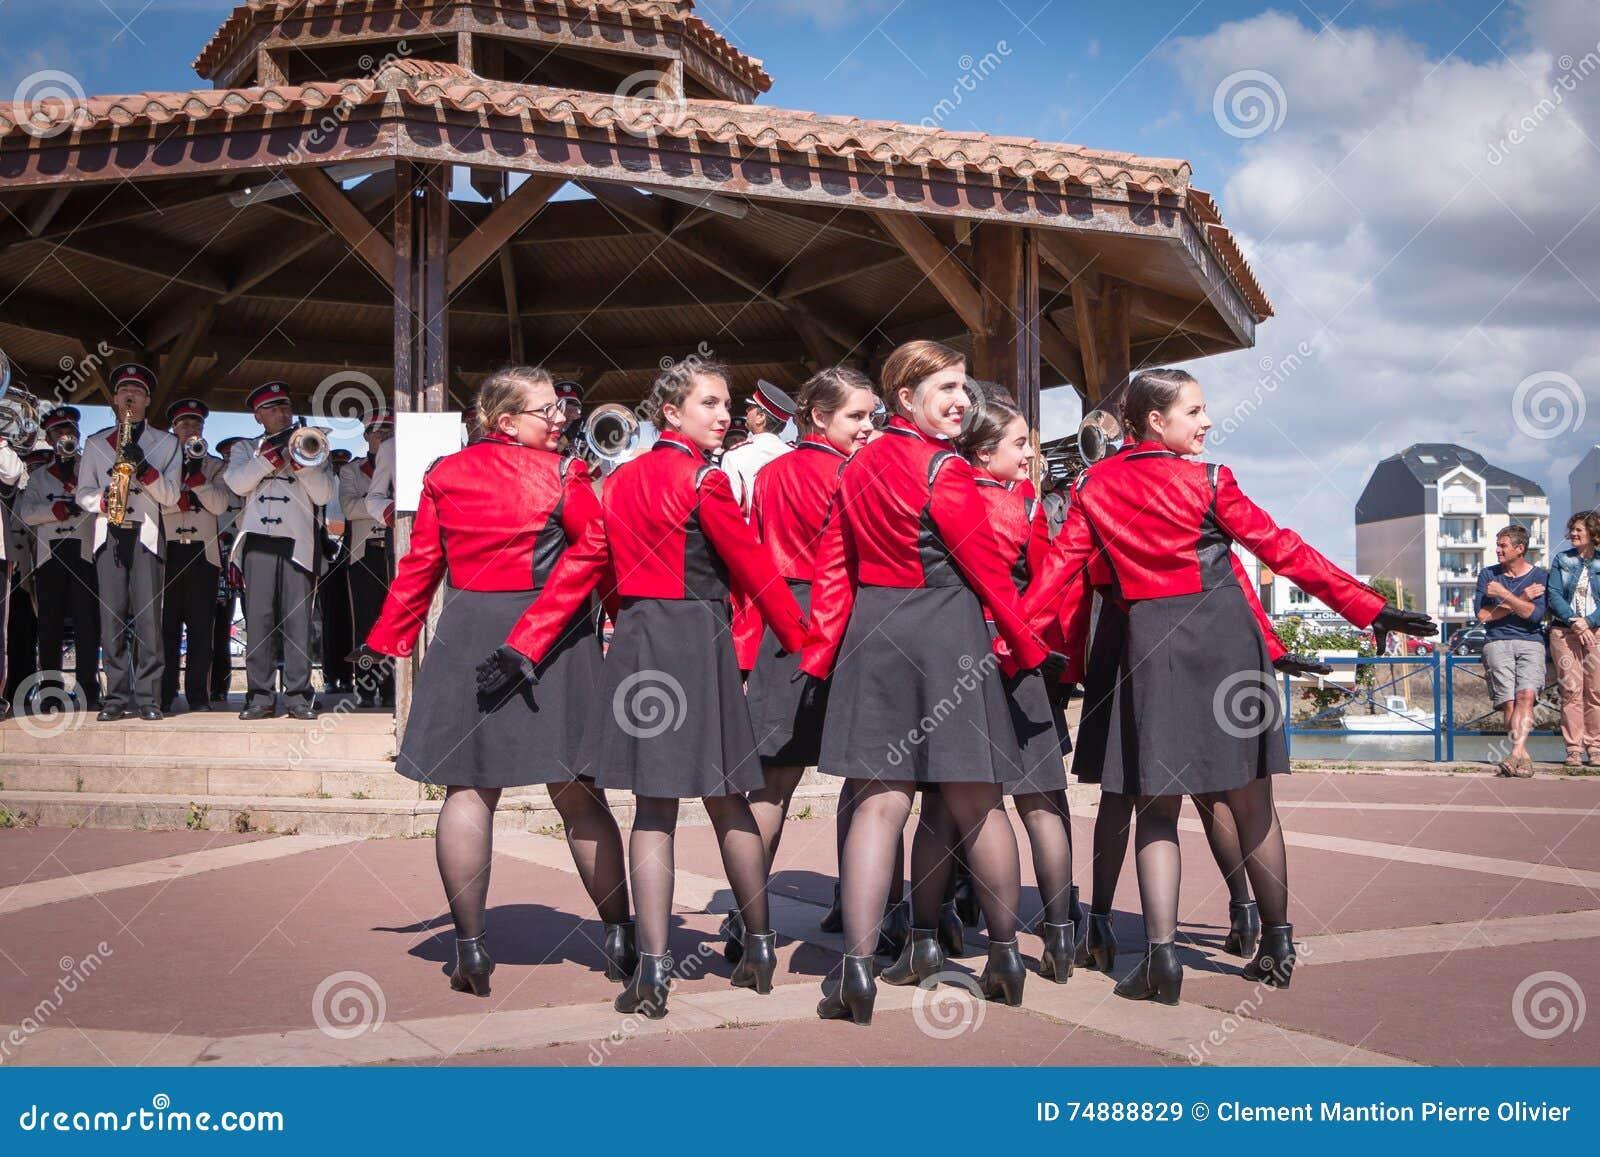 Dança da fanfarra na rua